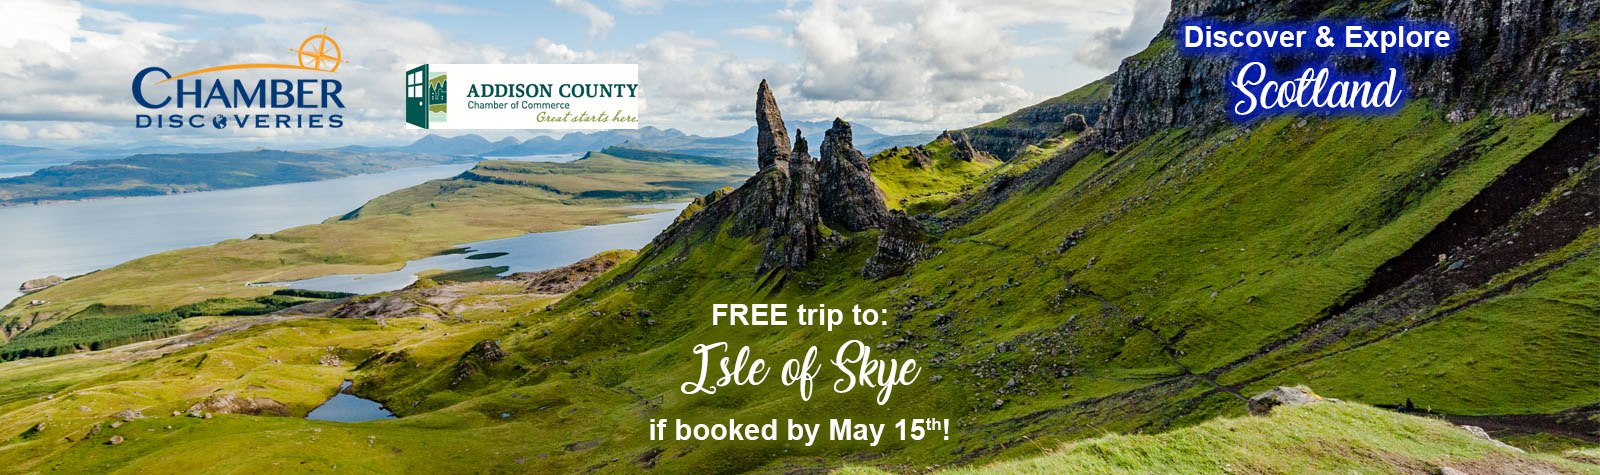 CD_Scotland_Banner_Addison-(Isle-of-Skye).jpg